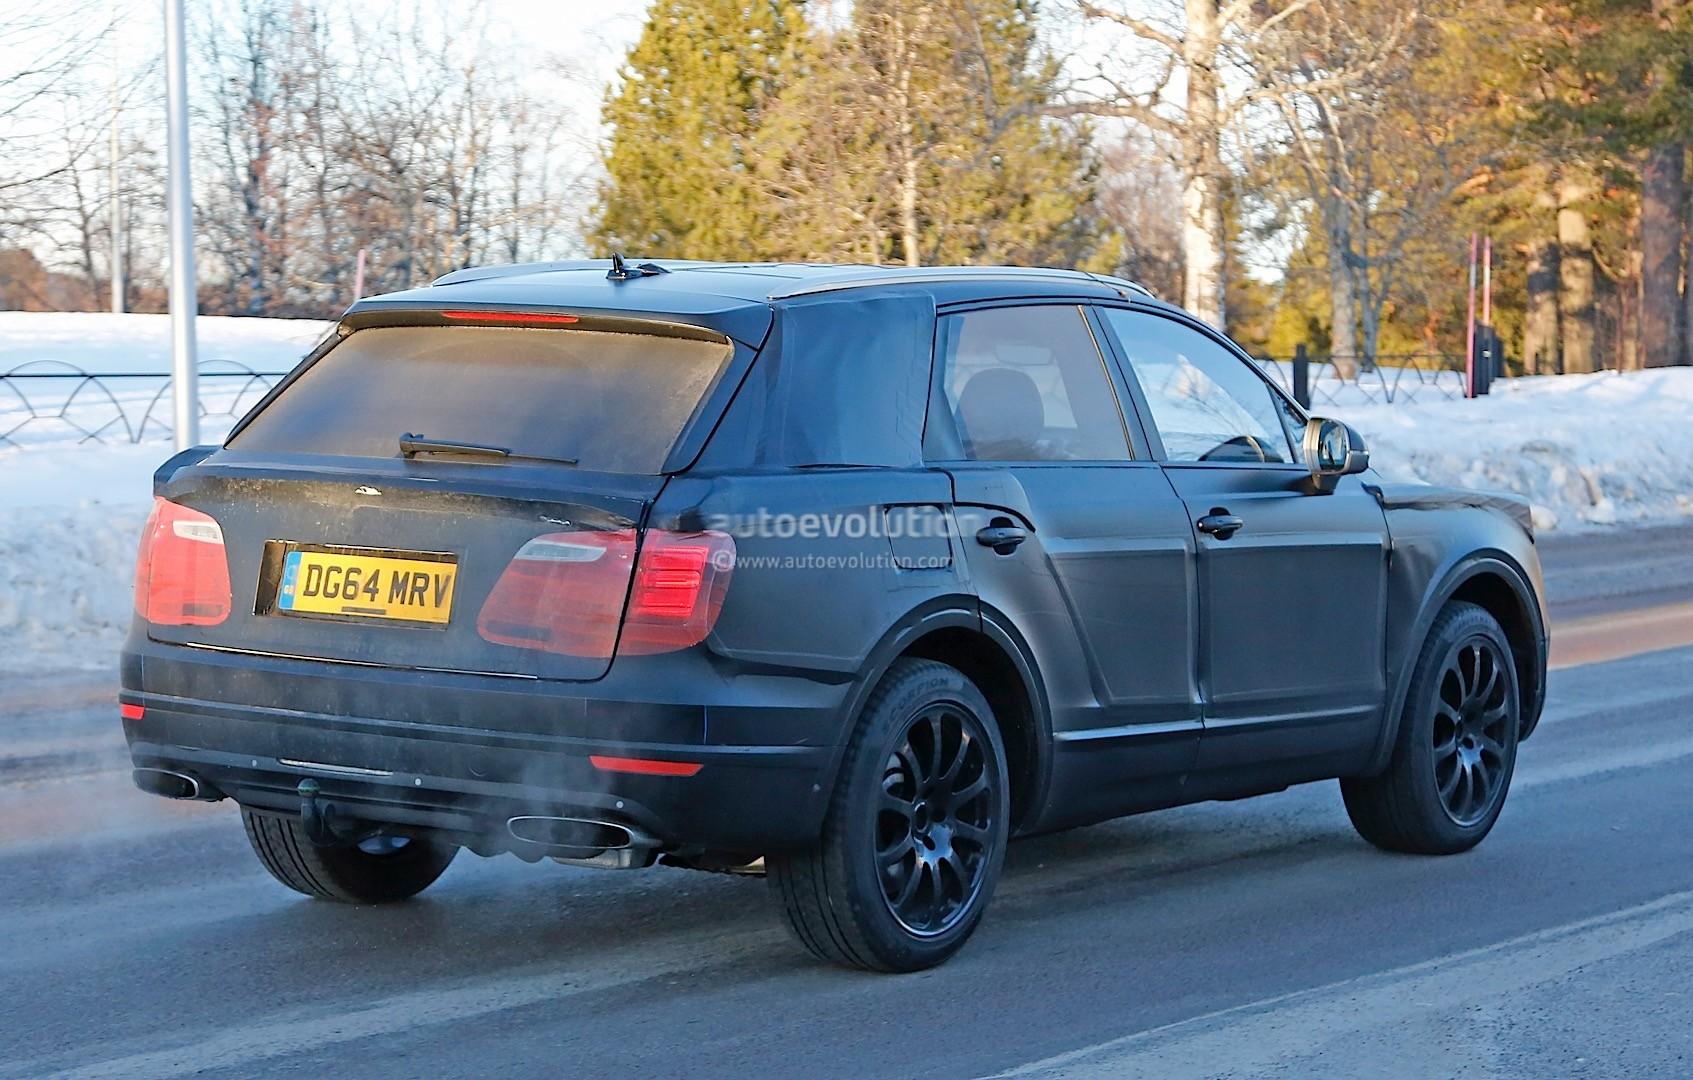 2015 - [Bentley] Bentayga - Page 5 Bentley-bentayga-spied-once-again-looks-like-an-edgier-vw-touareg-photo-gallery_8